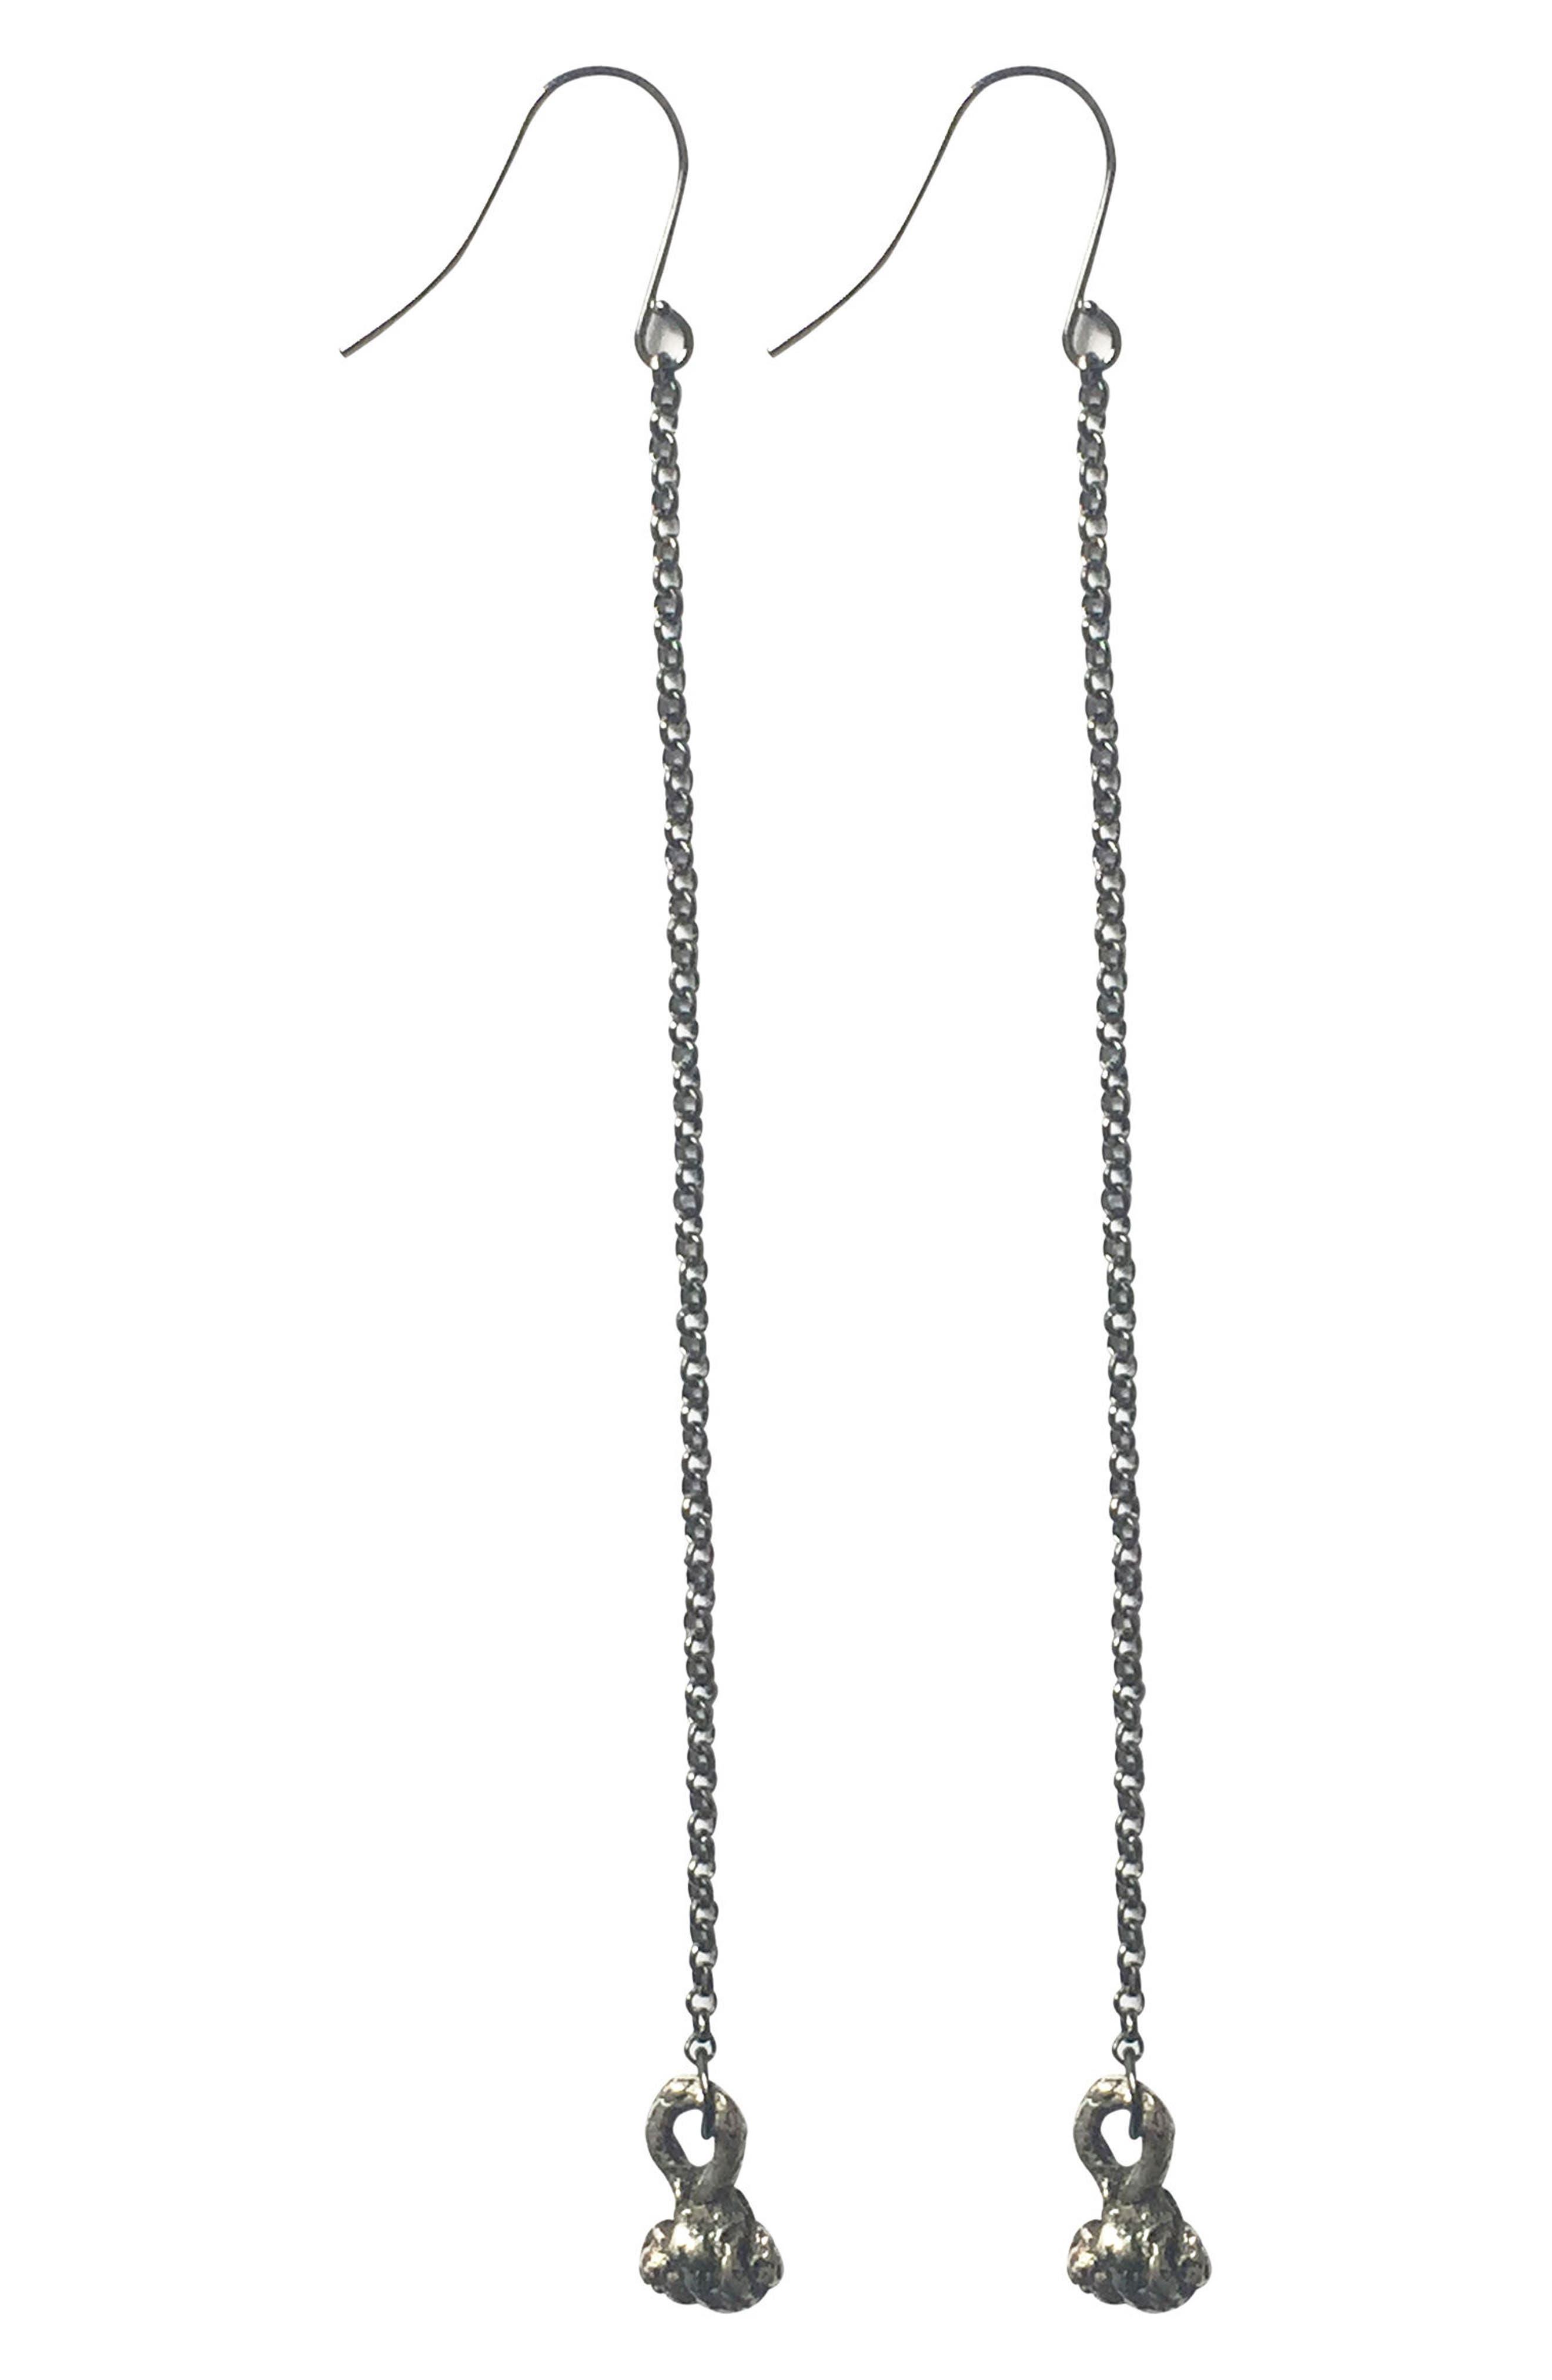 Chain Drop Earrings,                         Main,                         color, Oxidized Silver/ Gunmetal